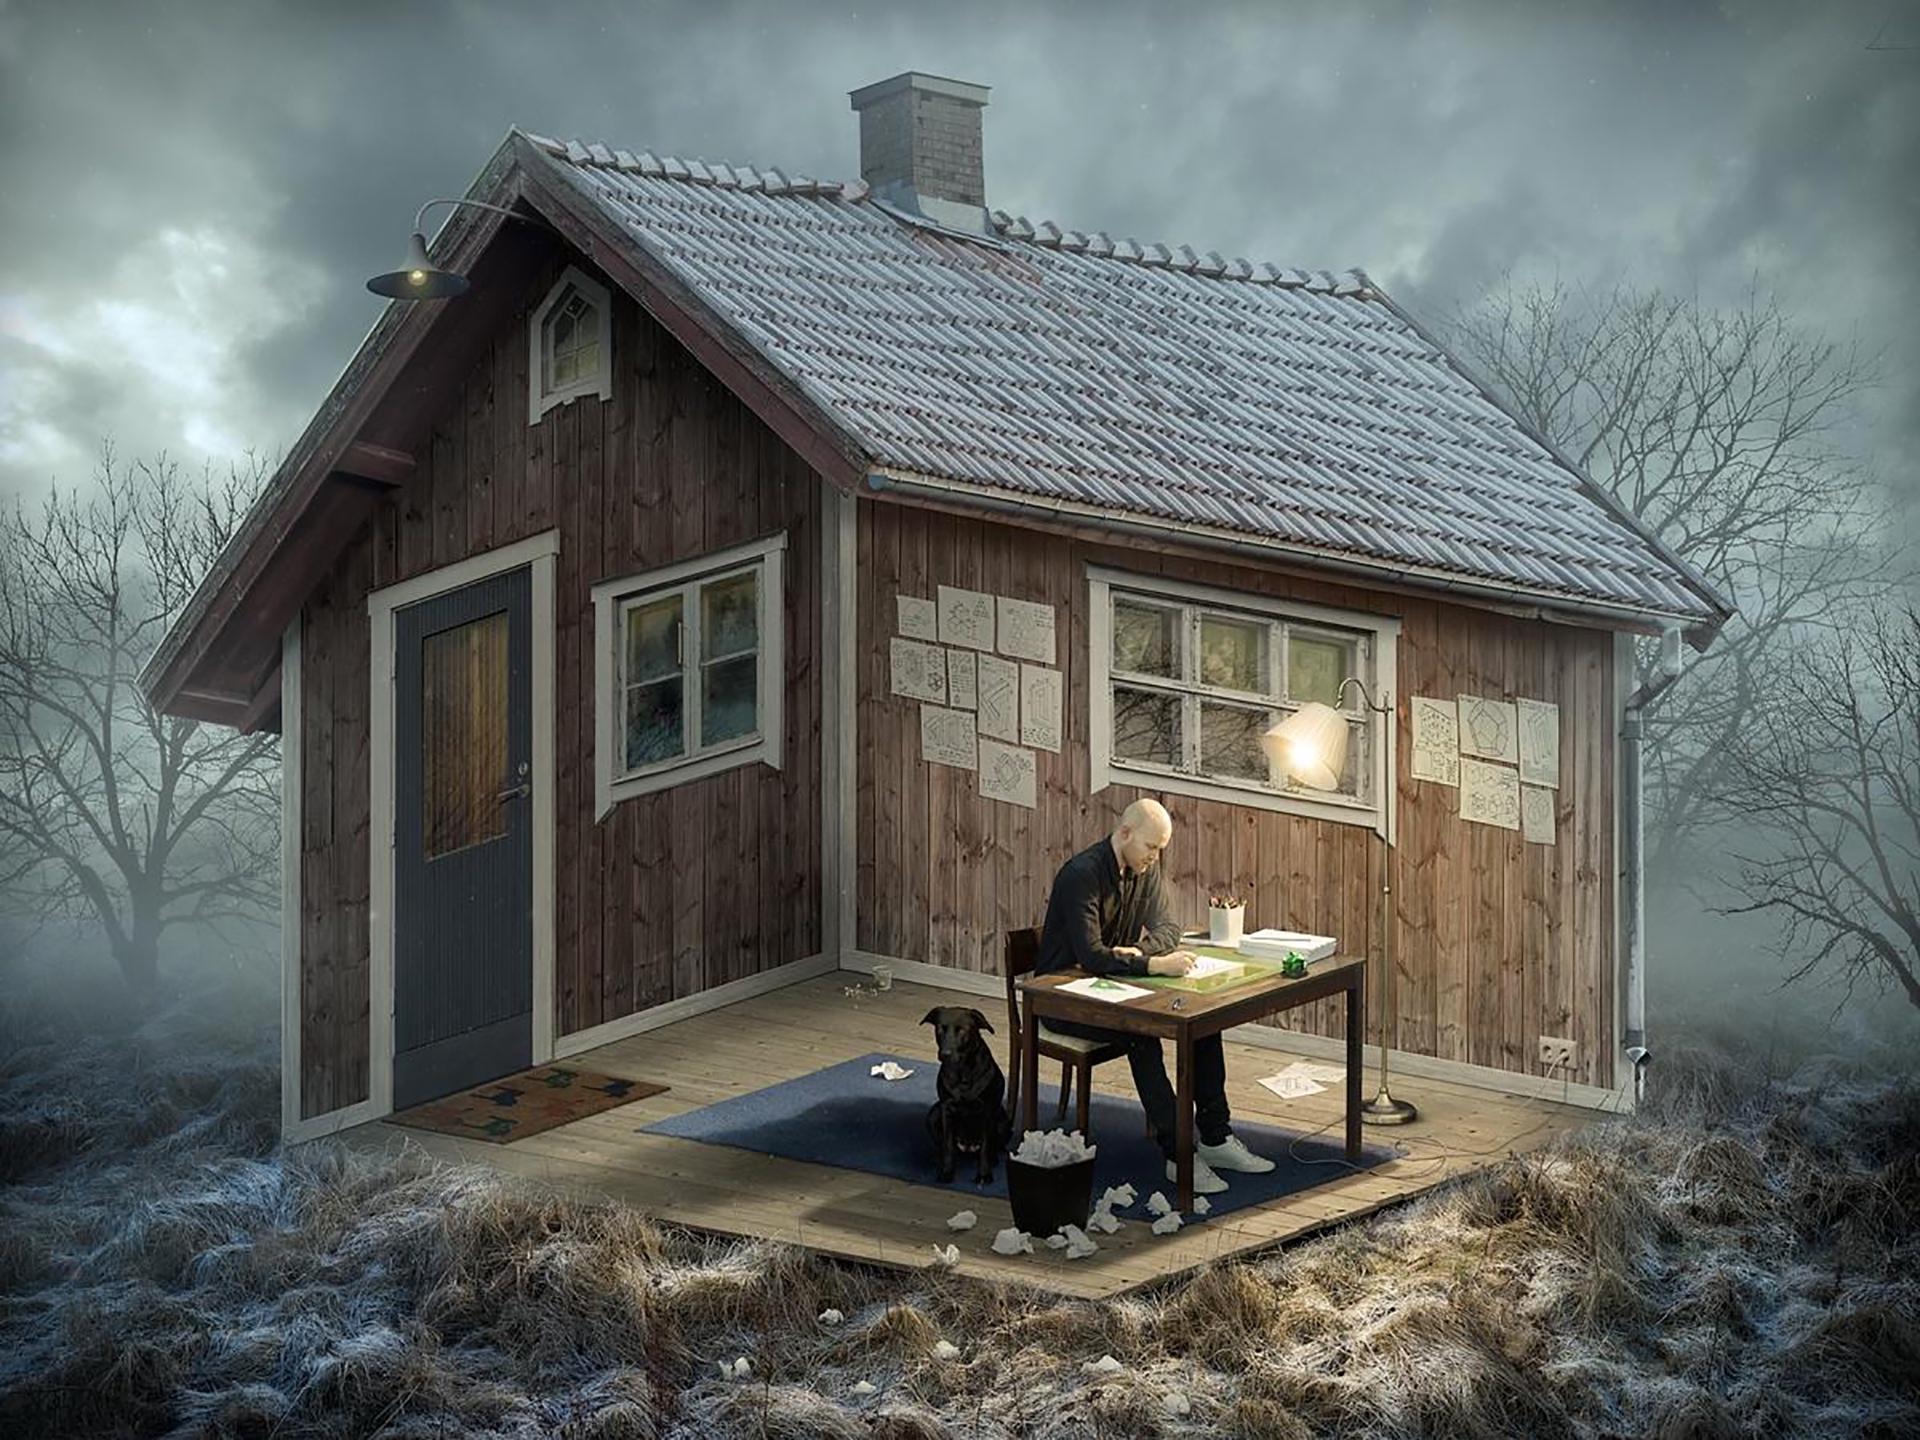 The Architect (2015) by Erik Johansson - Pako Campo